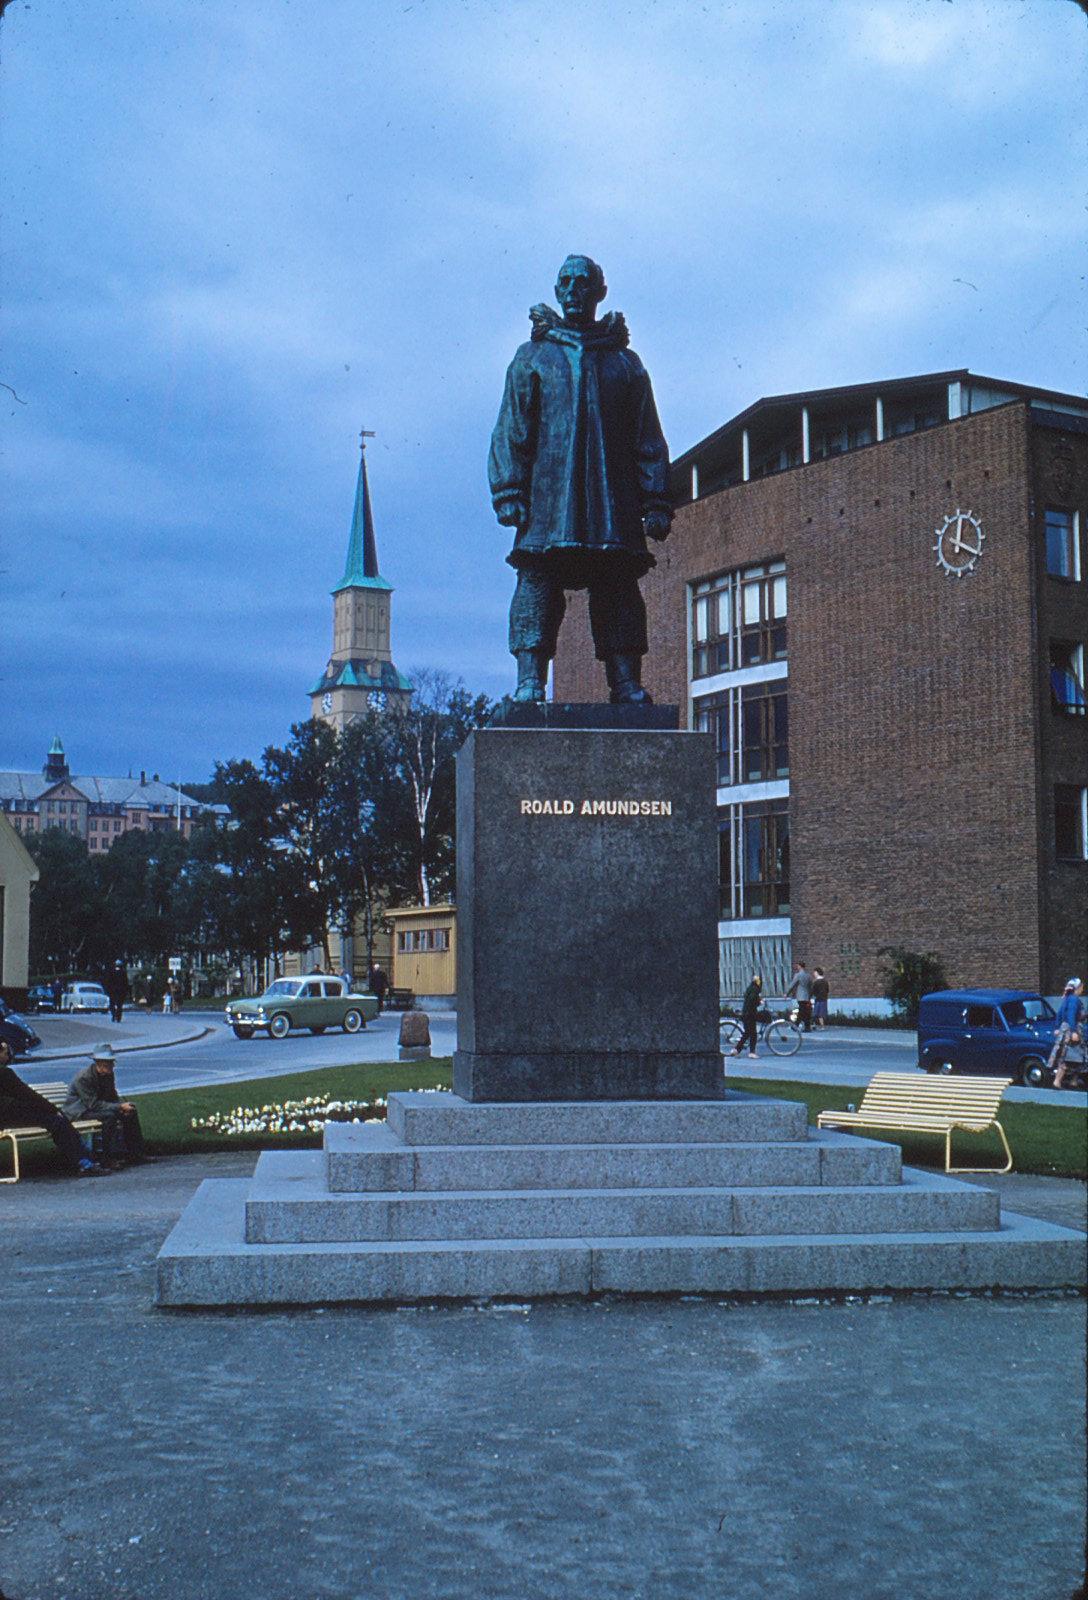 886 (35) Amundsen,Tromsø A